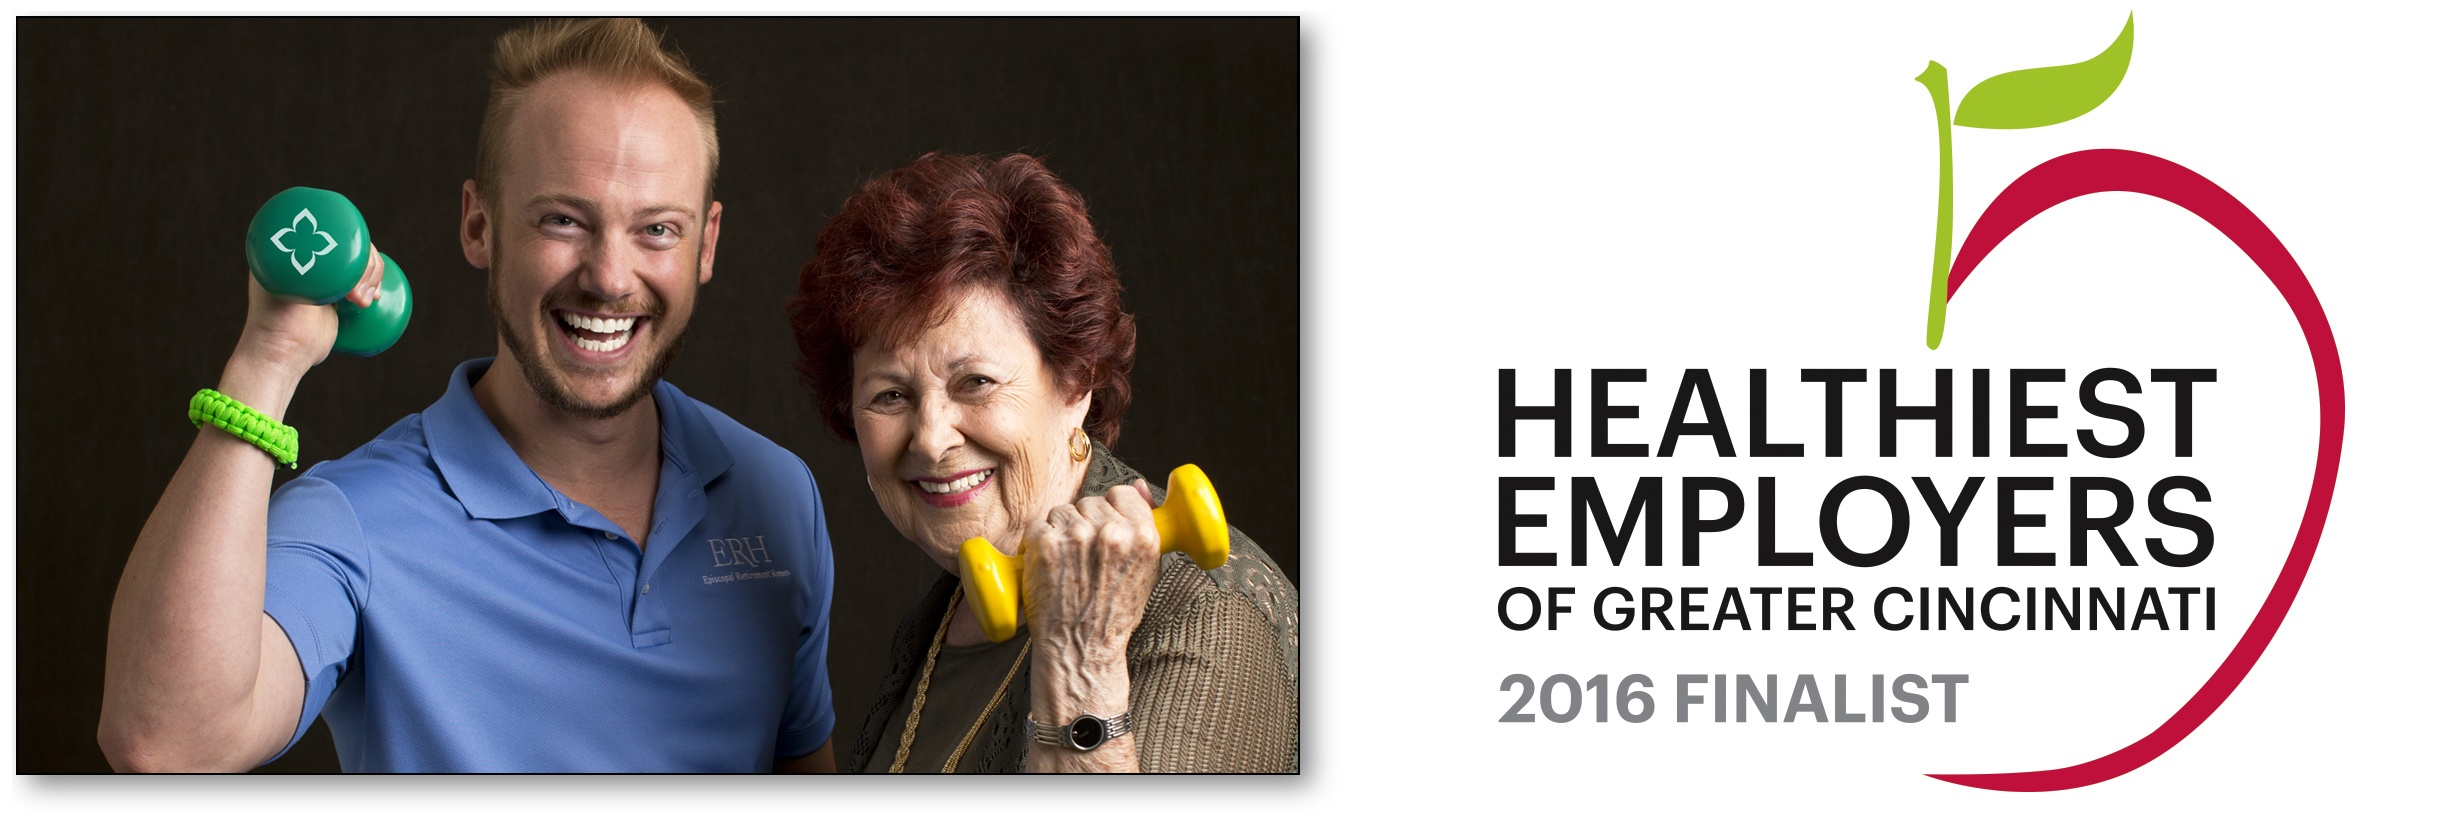 Healthiest_Employers_Finalist_logo-w-Fitnessimage.jpg